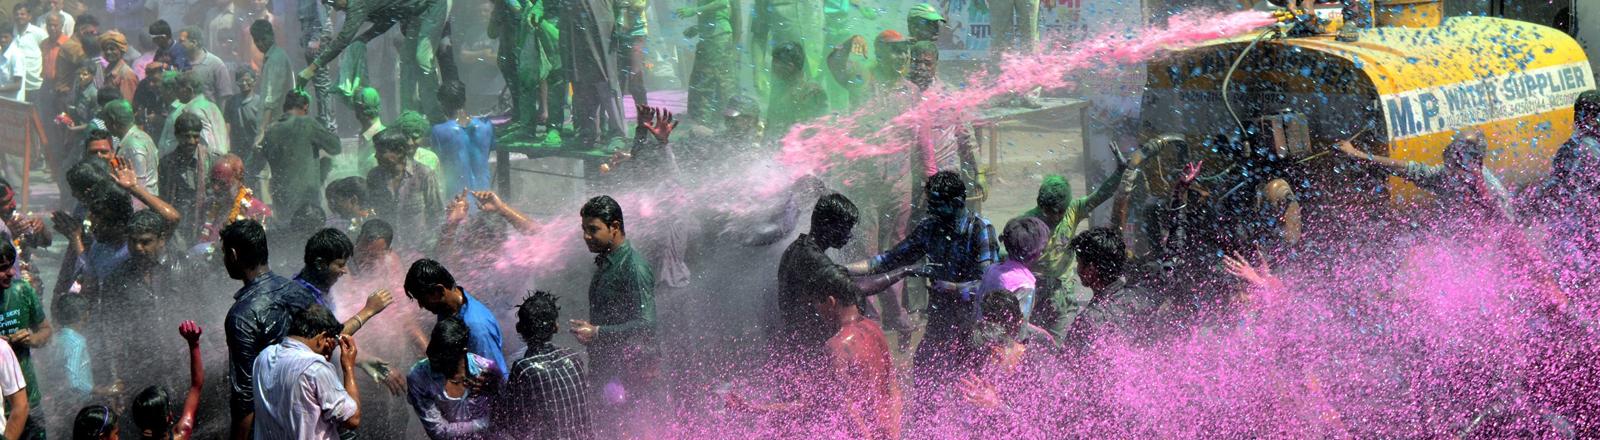 Holi Festival in Bhopal